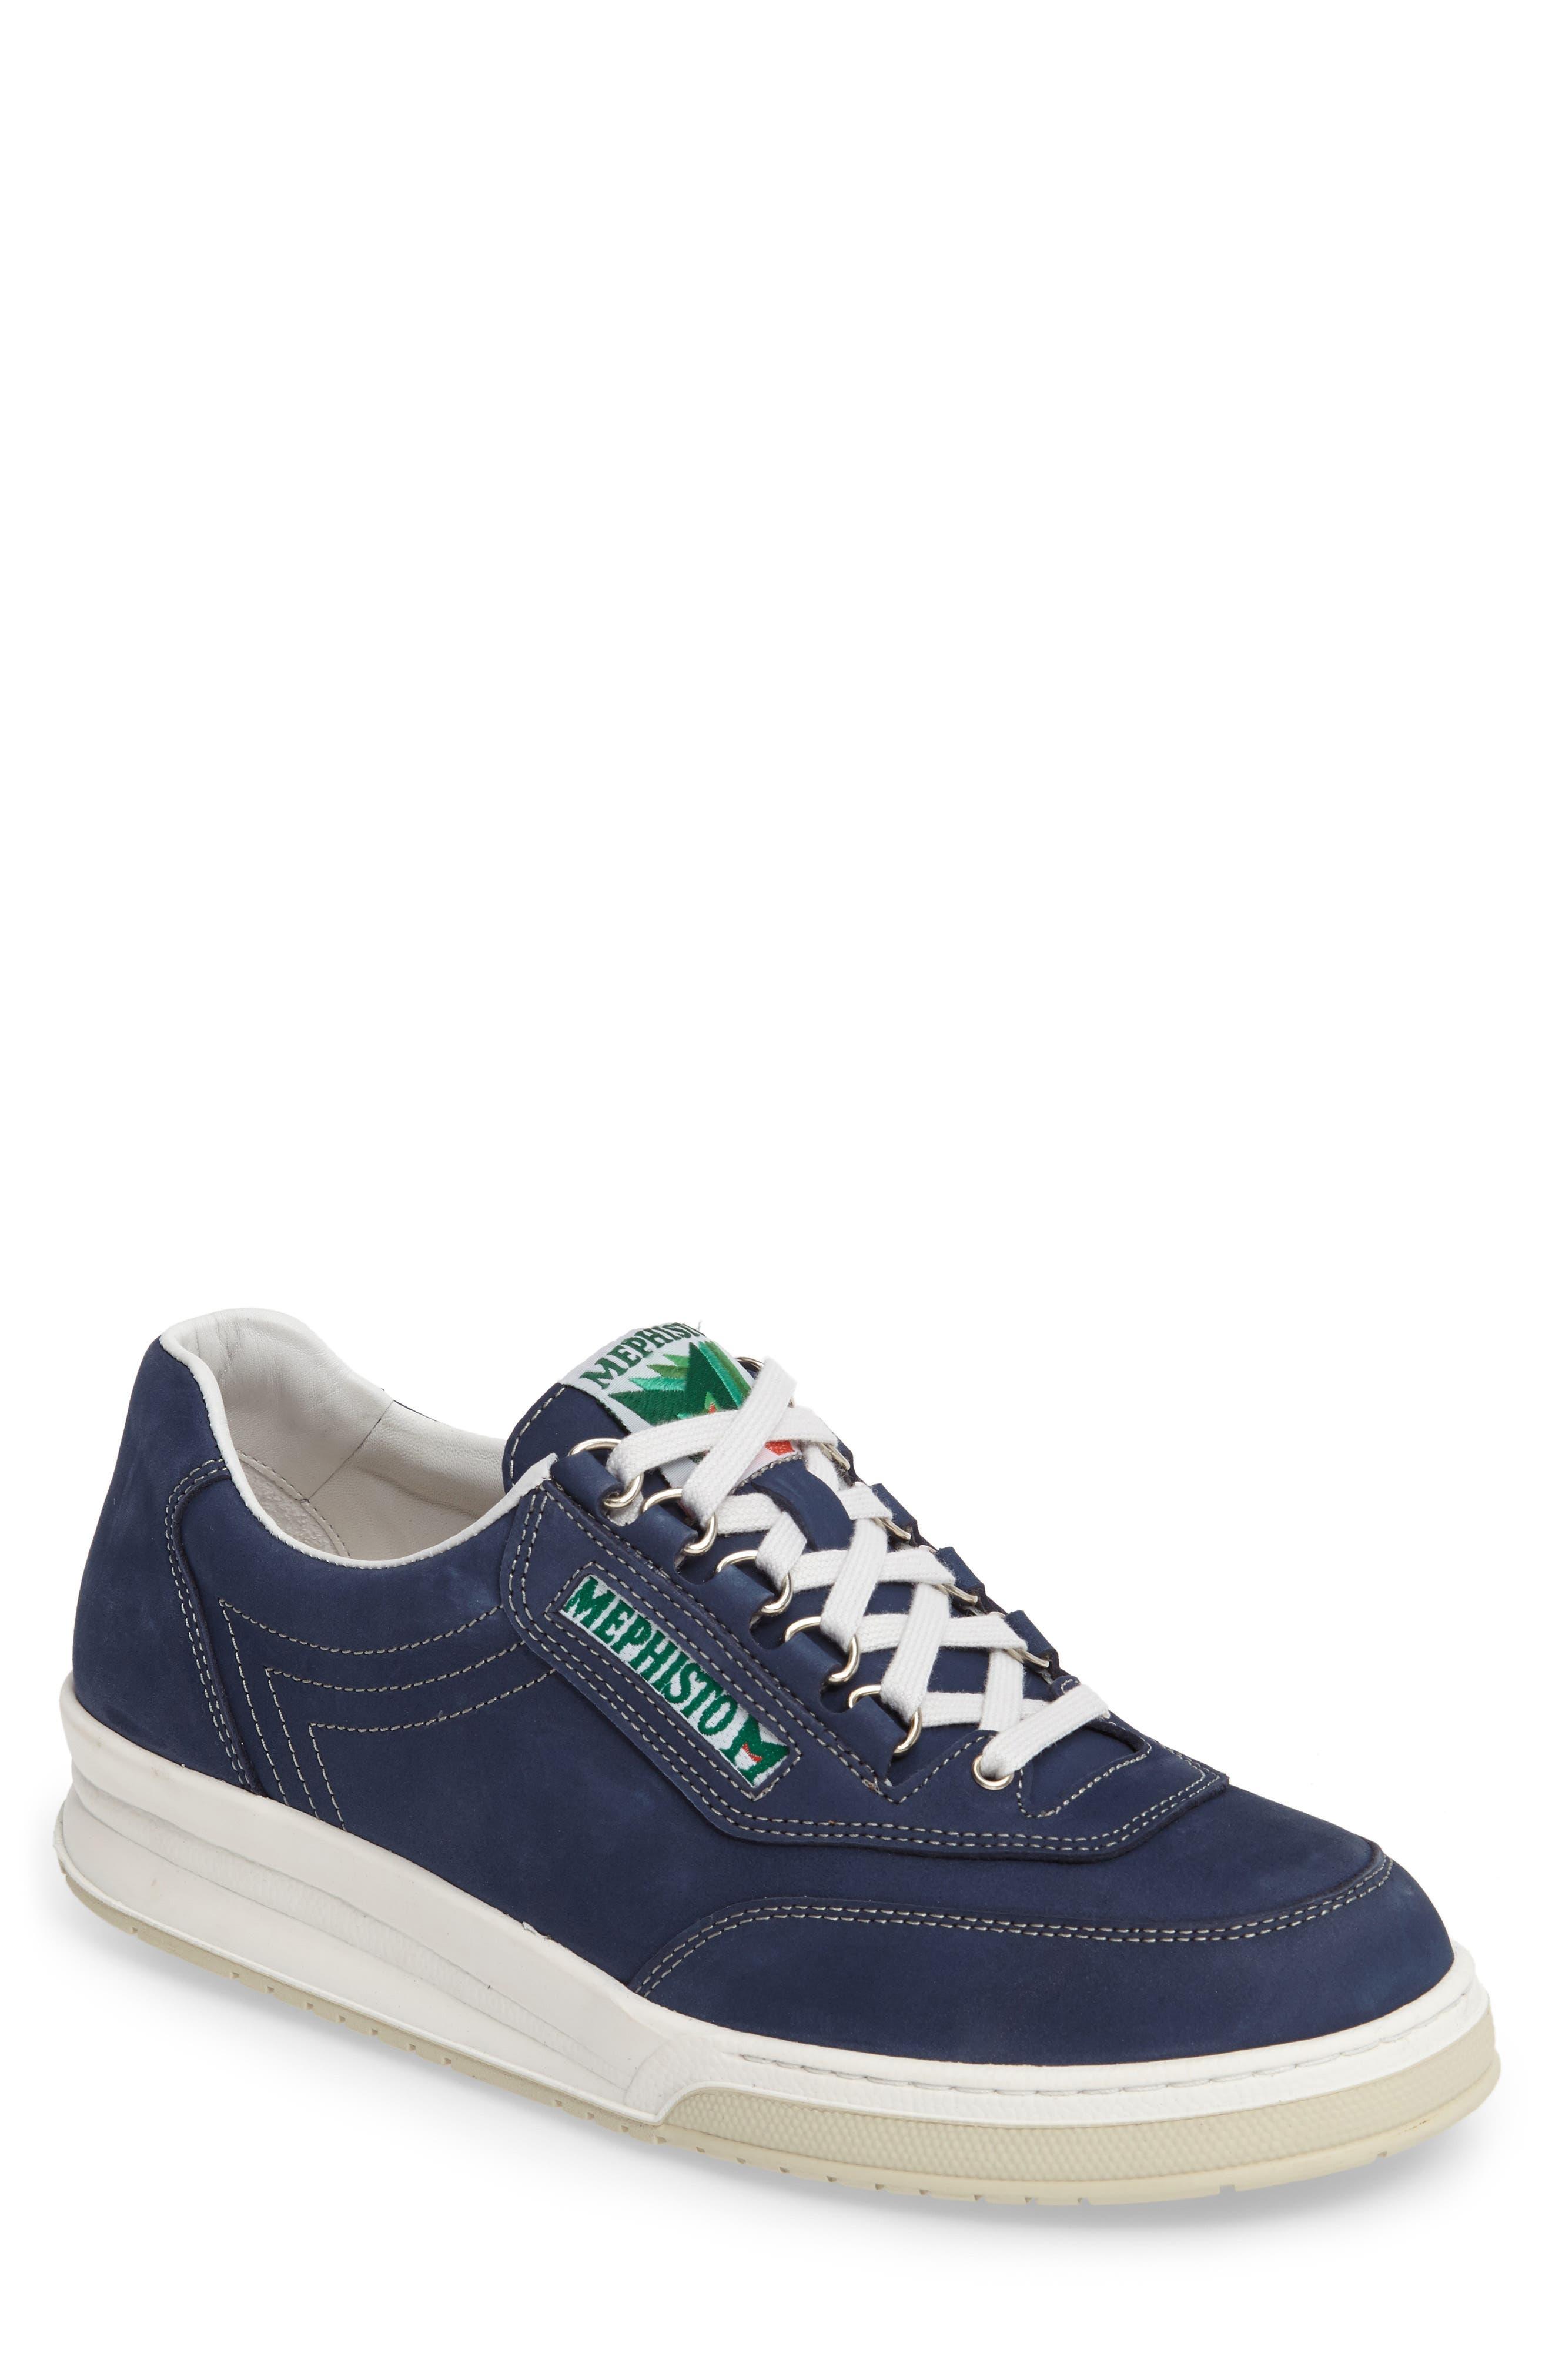 Alternate Image 1 Selected - Mephisto 'Match' Walking Shoe (Men)